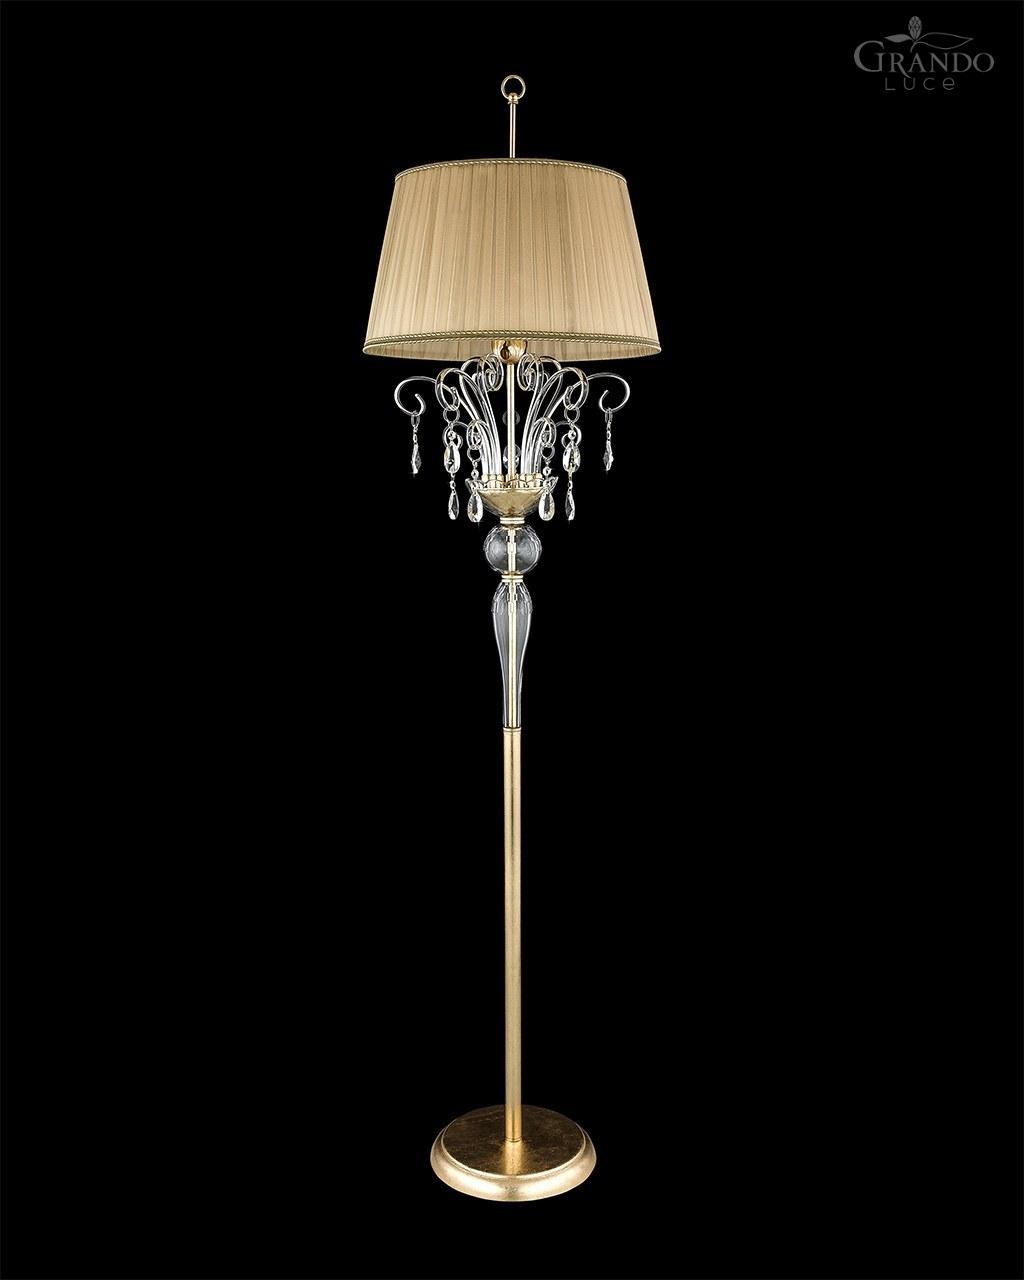 120 Fl Gold Leaf Crystal Floor Lamp Grandoluce